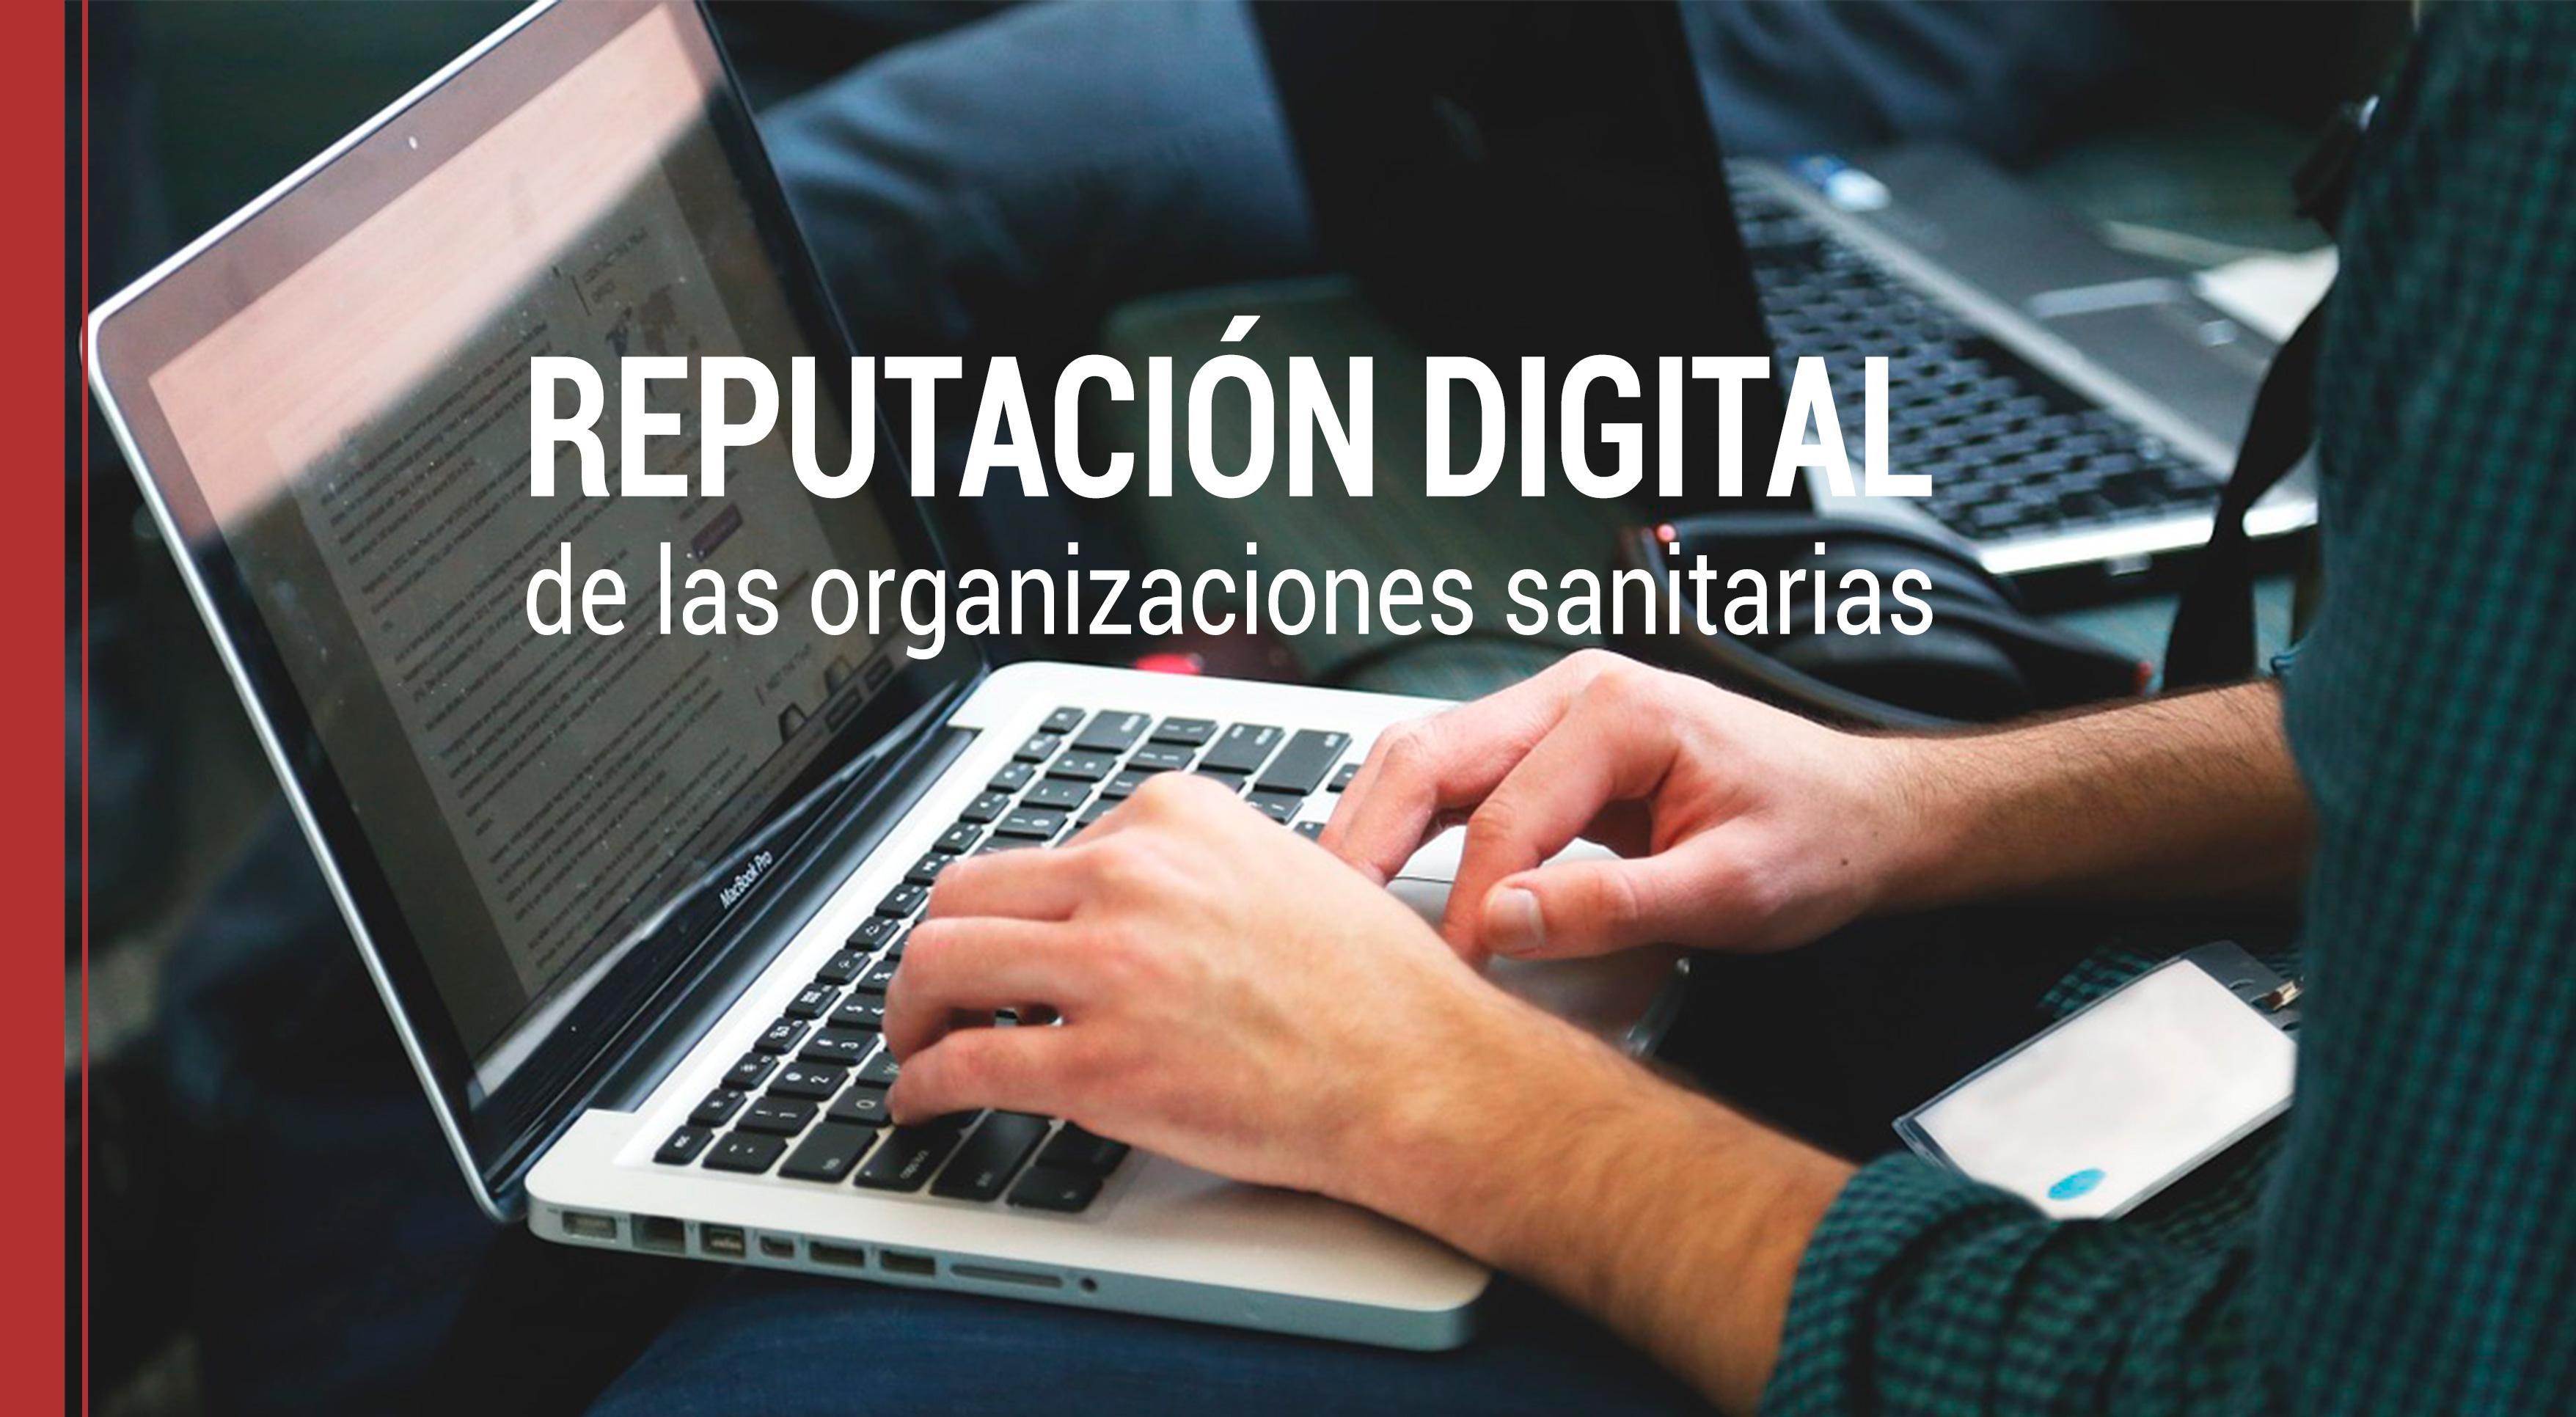 reputacion-digital-organizaciones-sanitarias-klout Klout: la reputación digital de las organizaciones sanitarias